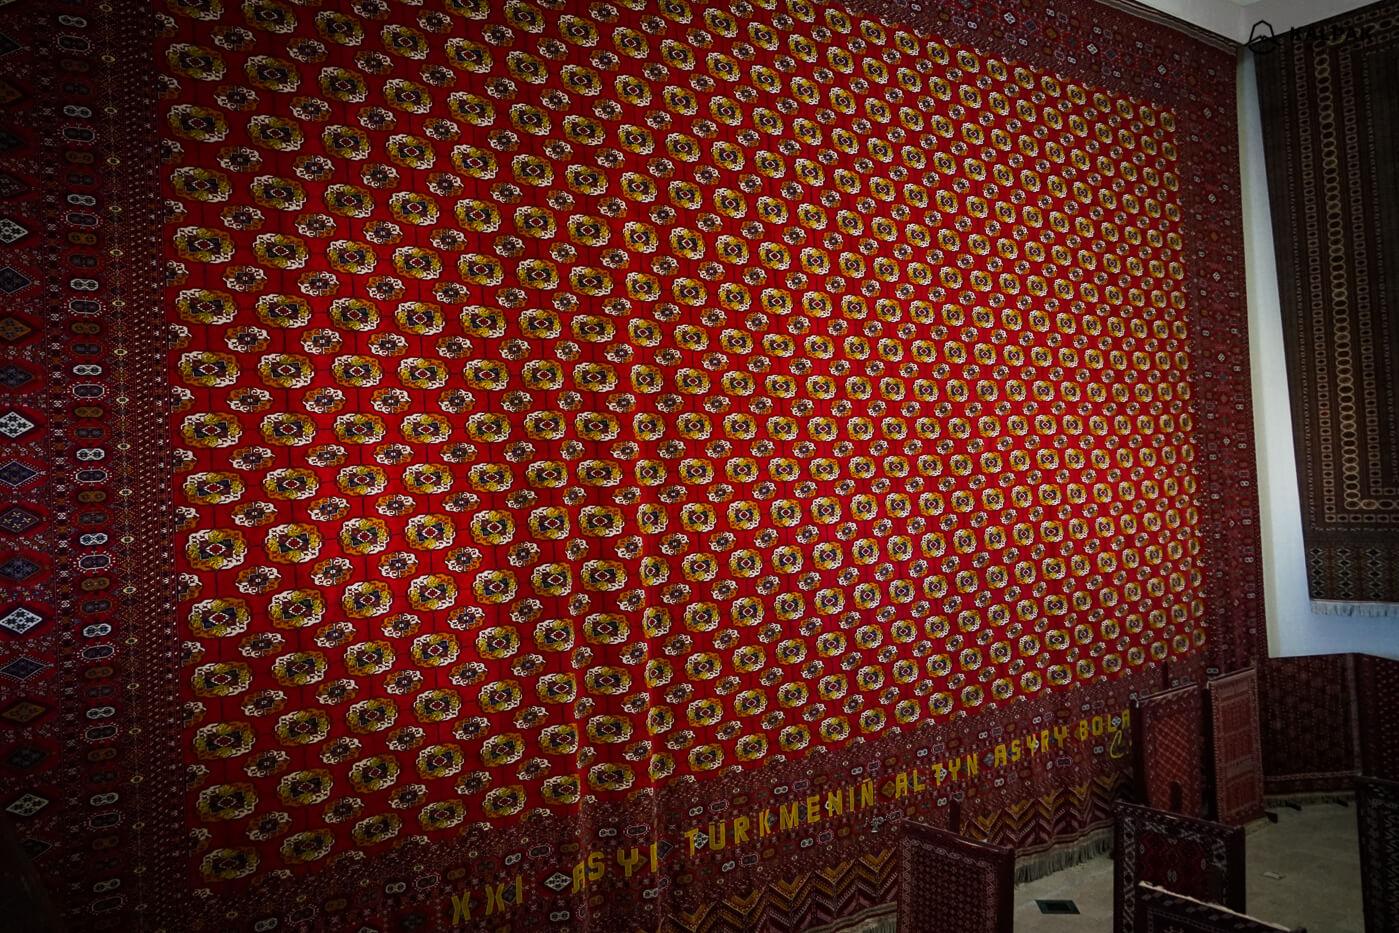 Turkmen carpet museum in Ashgabat